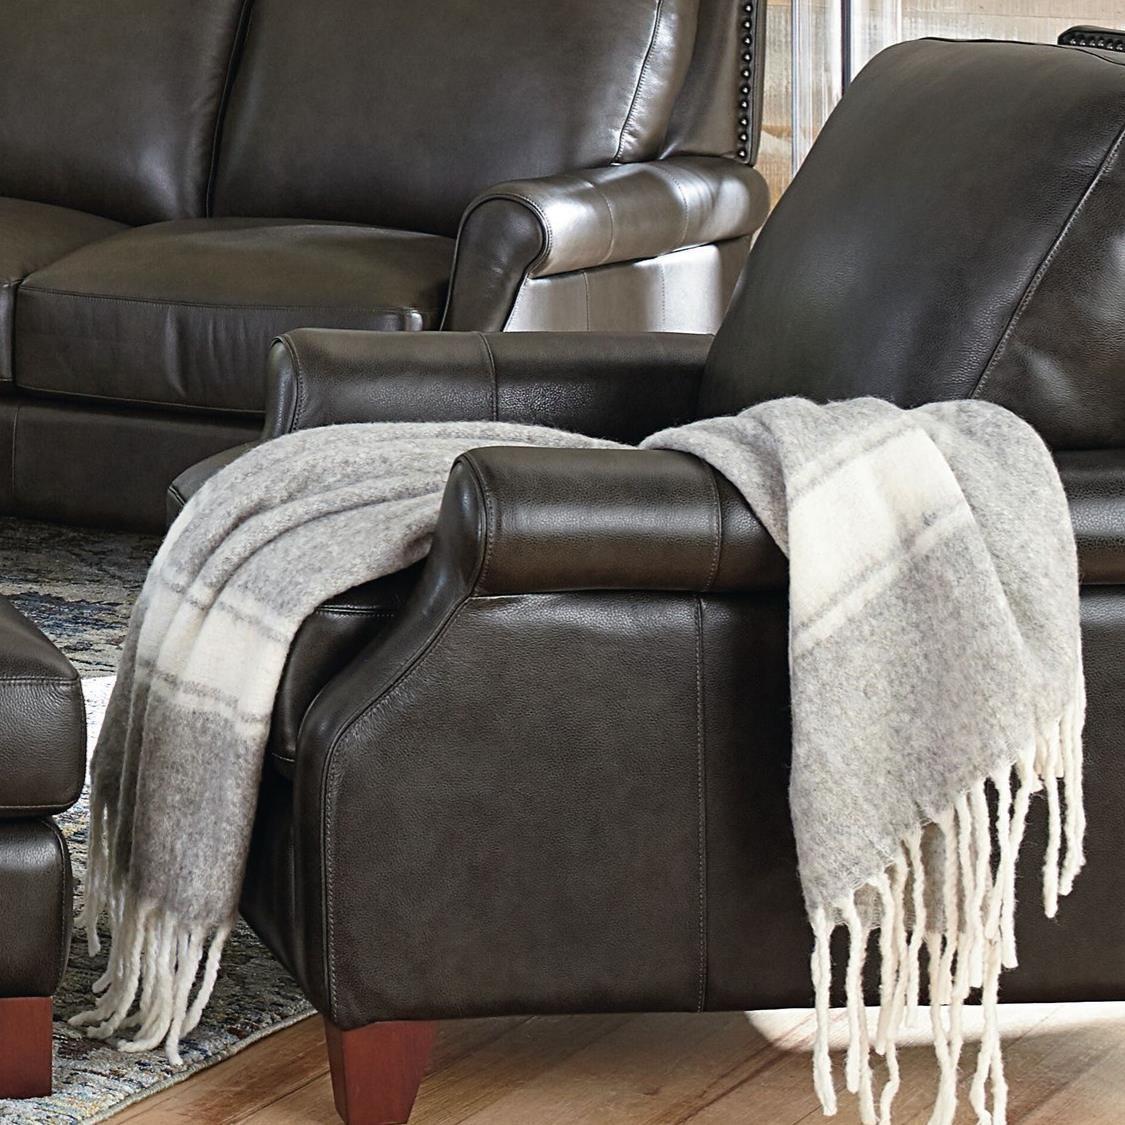 Greyson Chair by Bassett at Bassett of Cool Springs